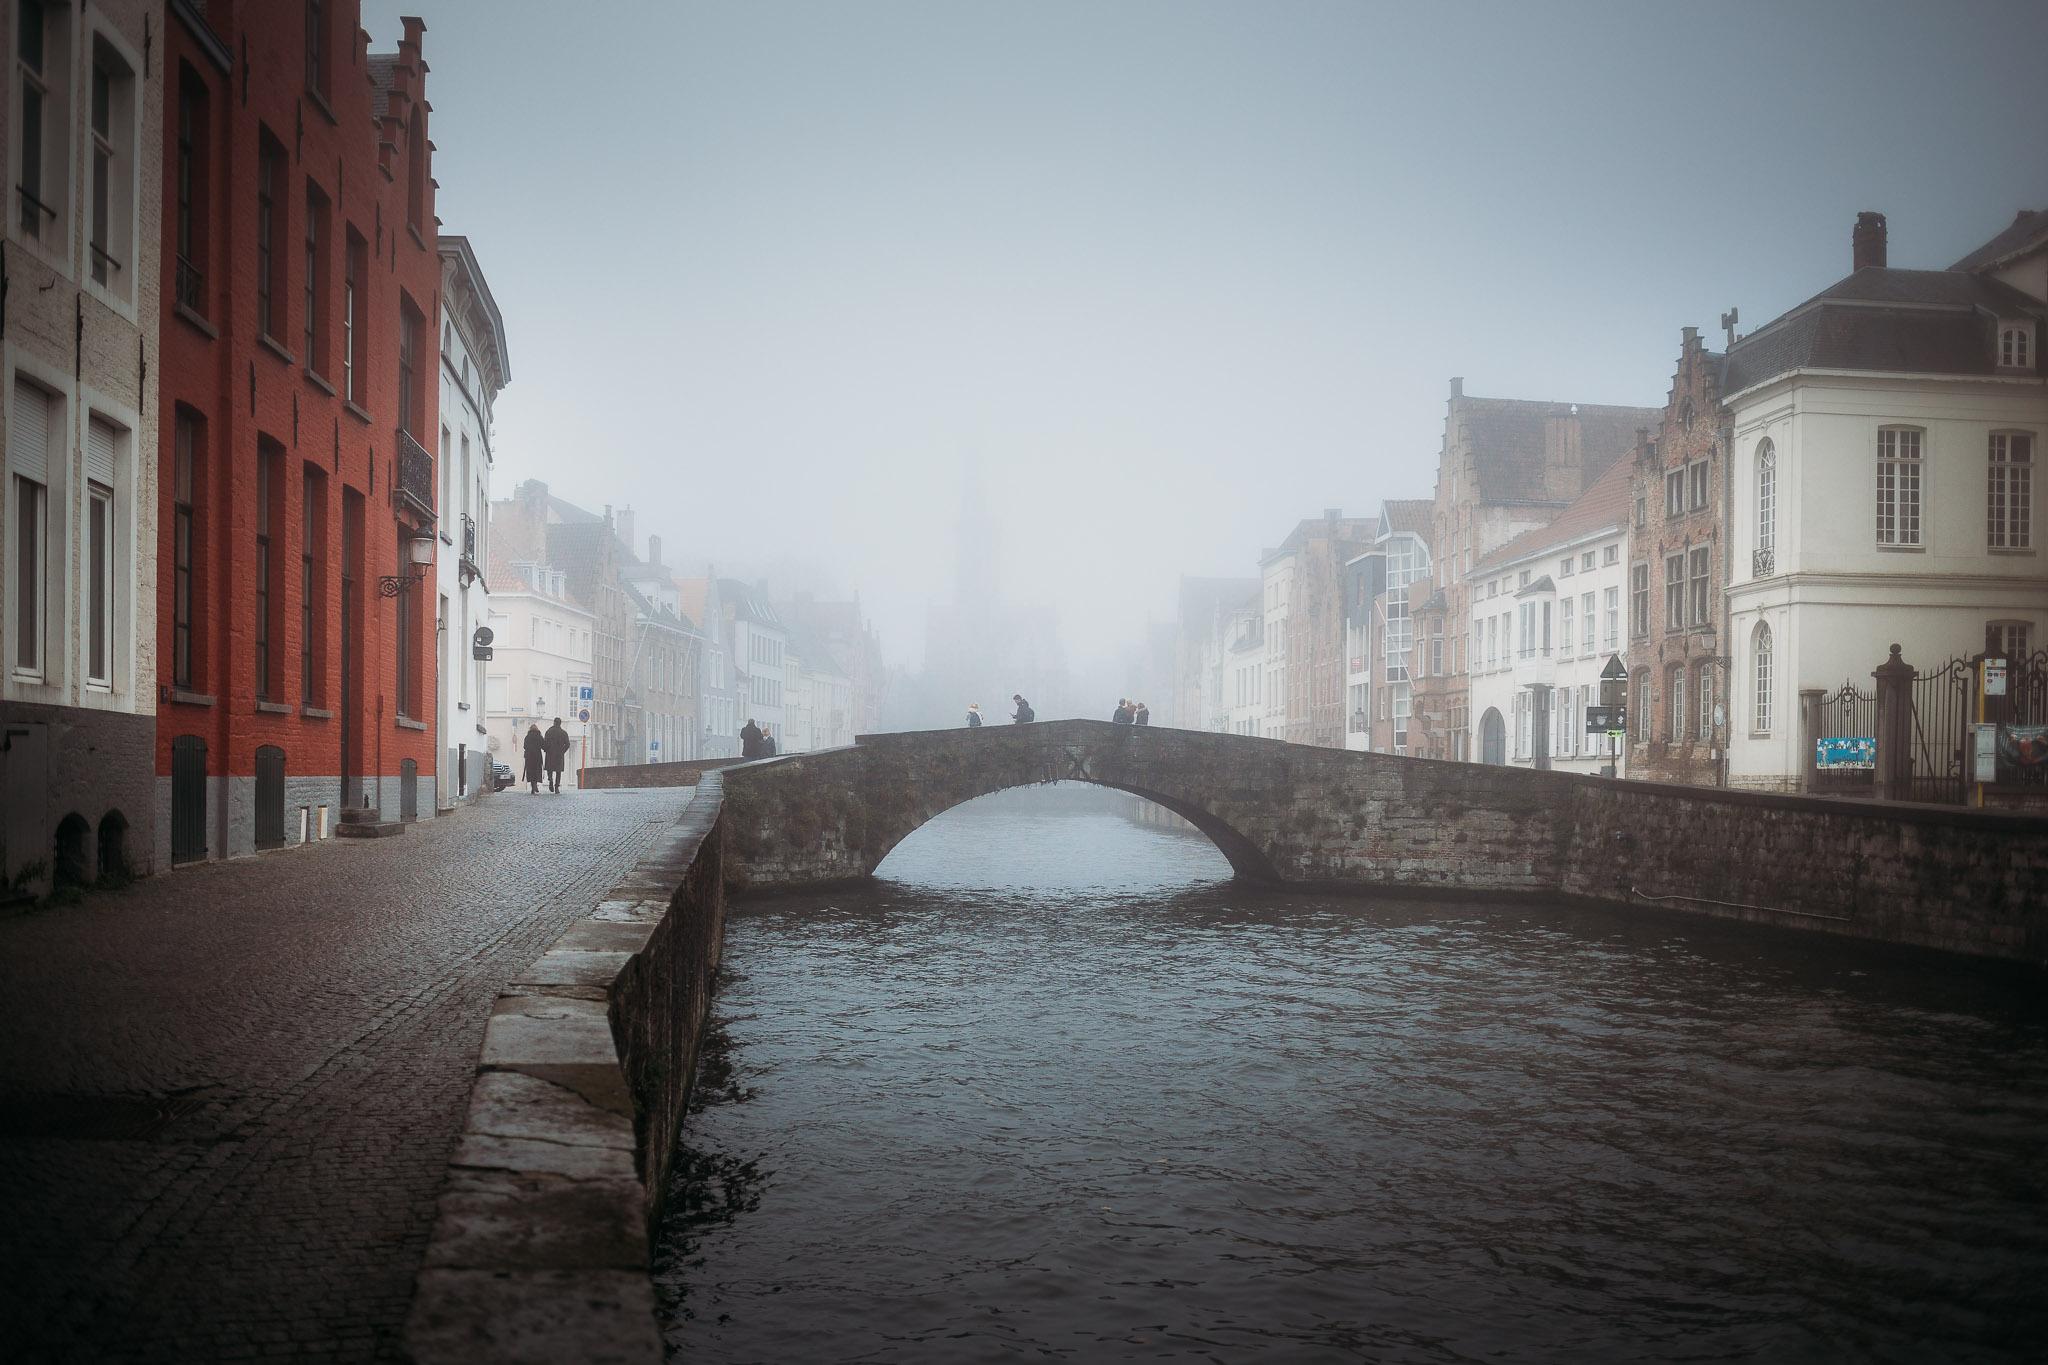 Misty canal in Bruges, Belgium